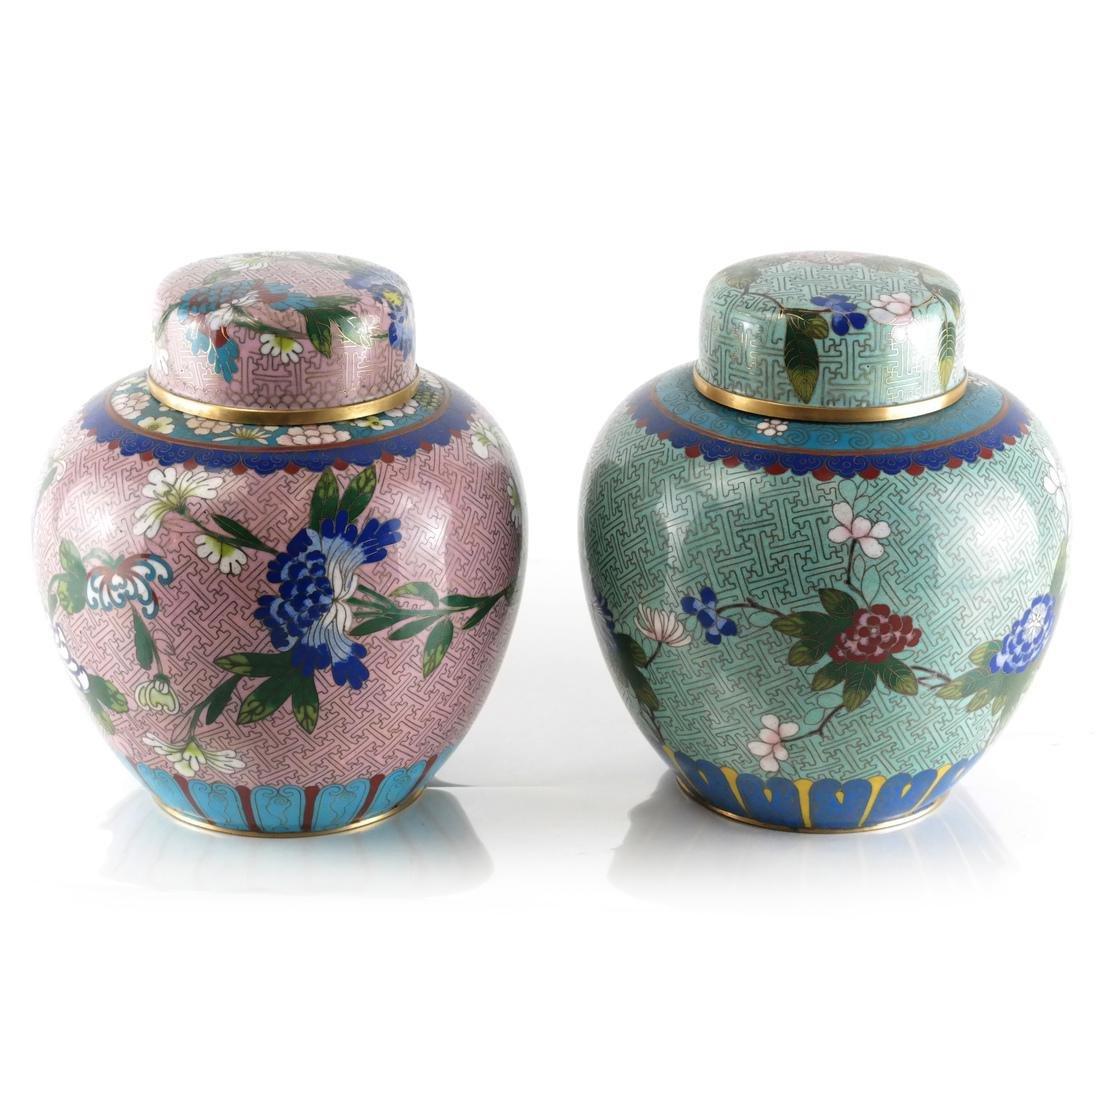 Pair Cloisonne Enamel Decorated Ginger Jars